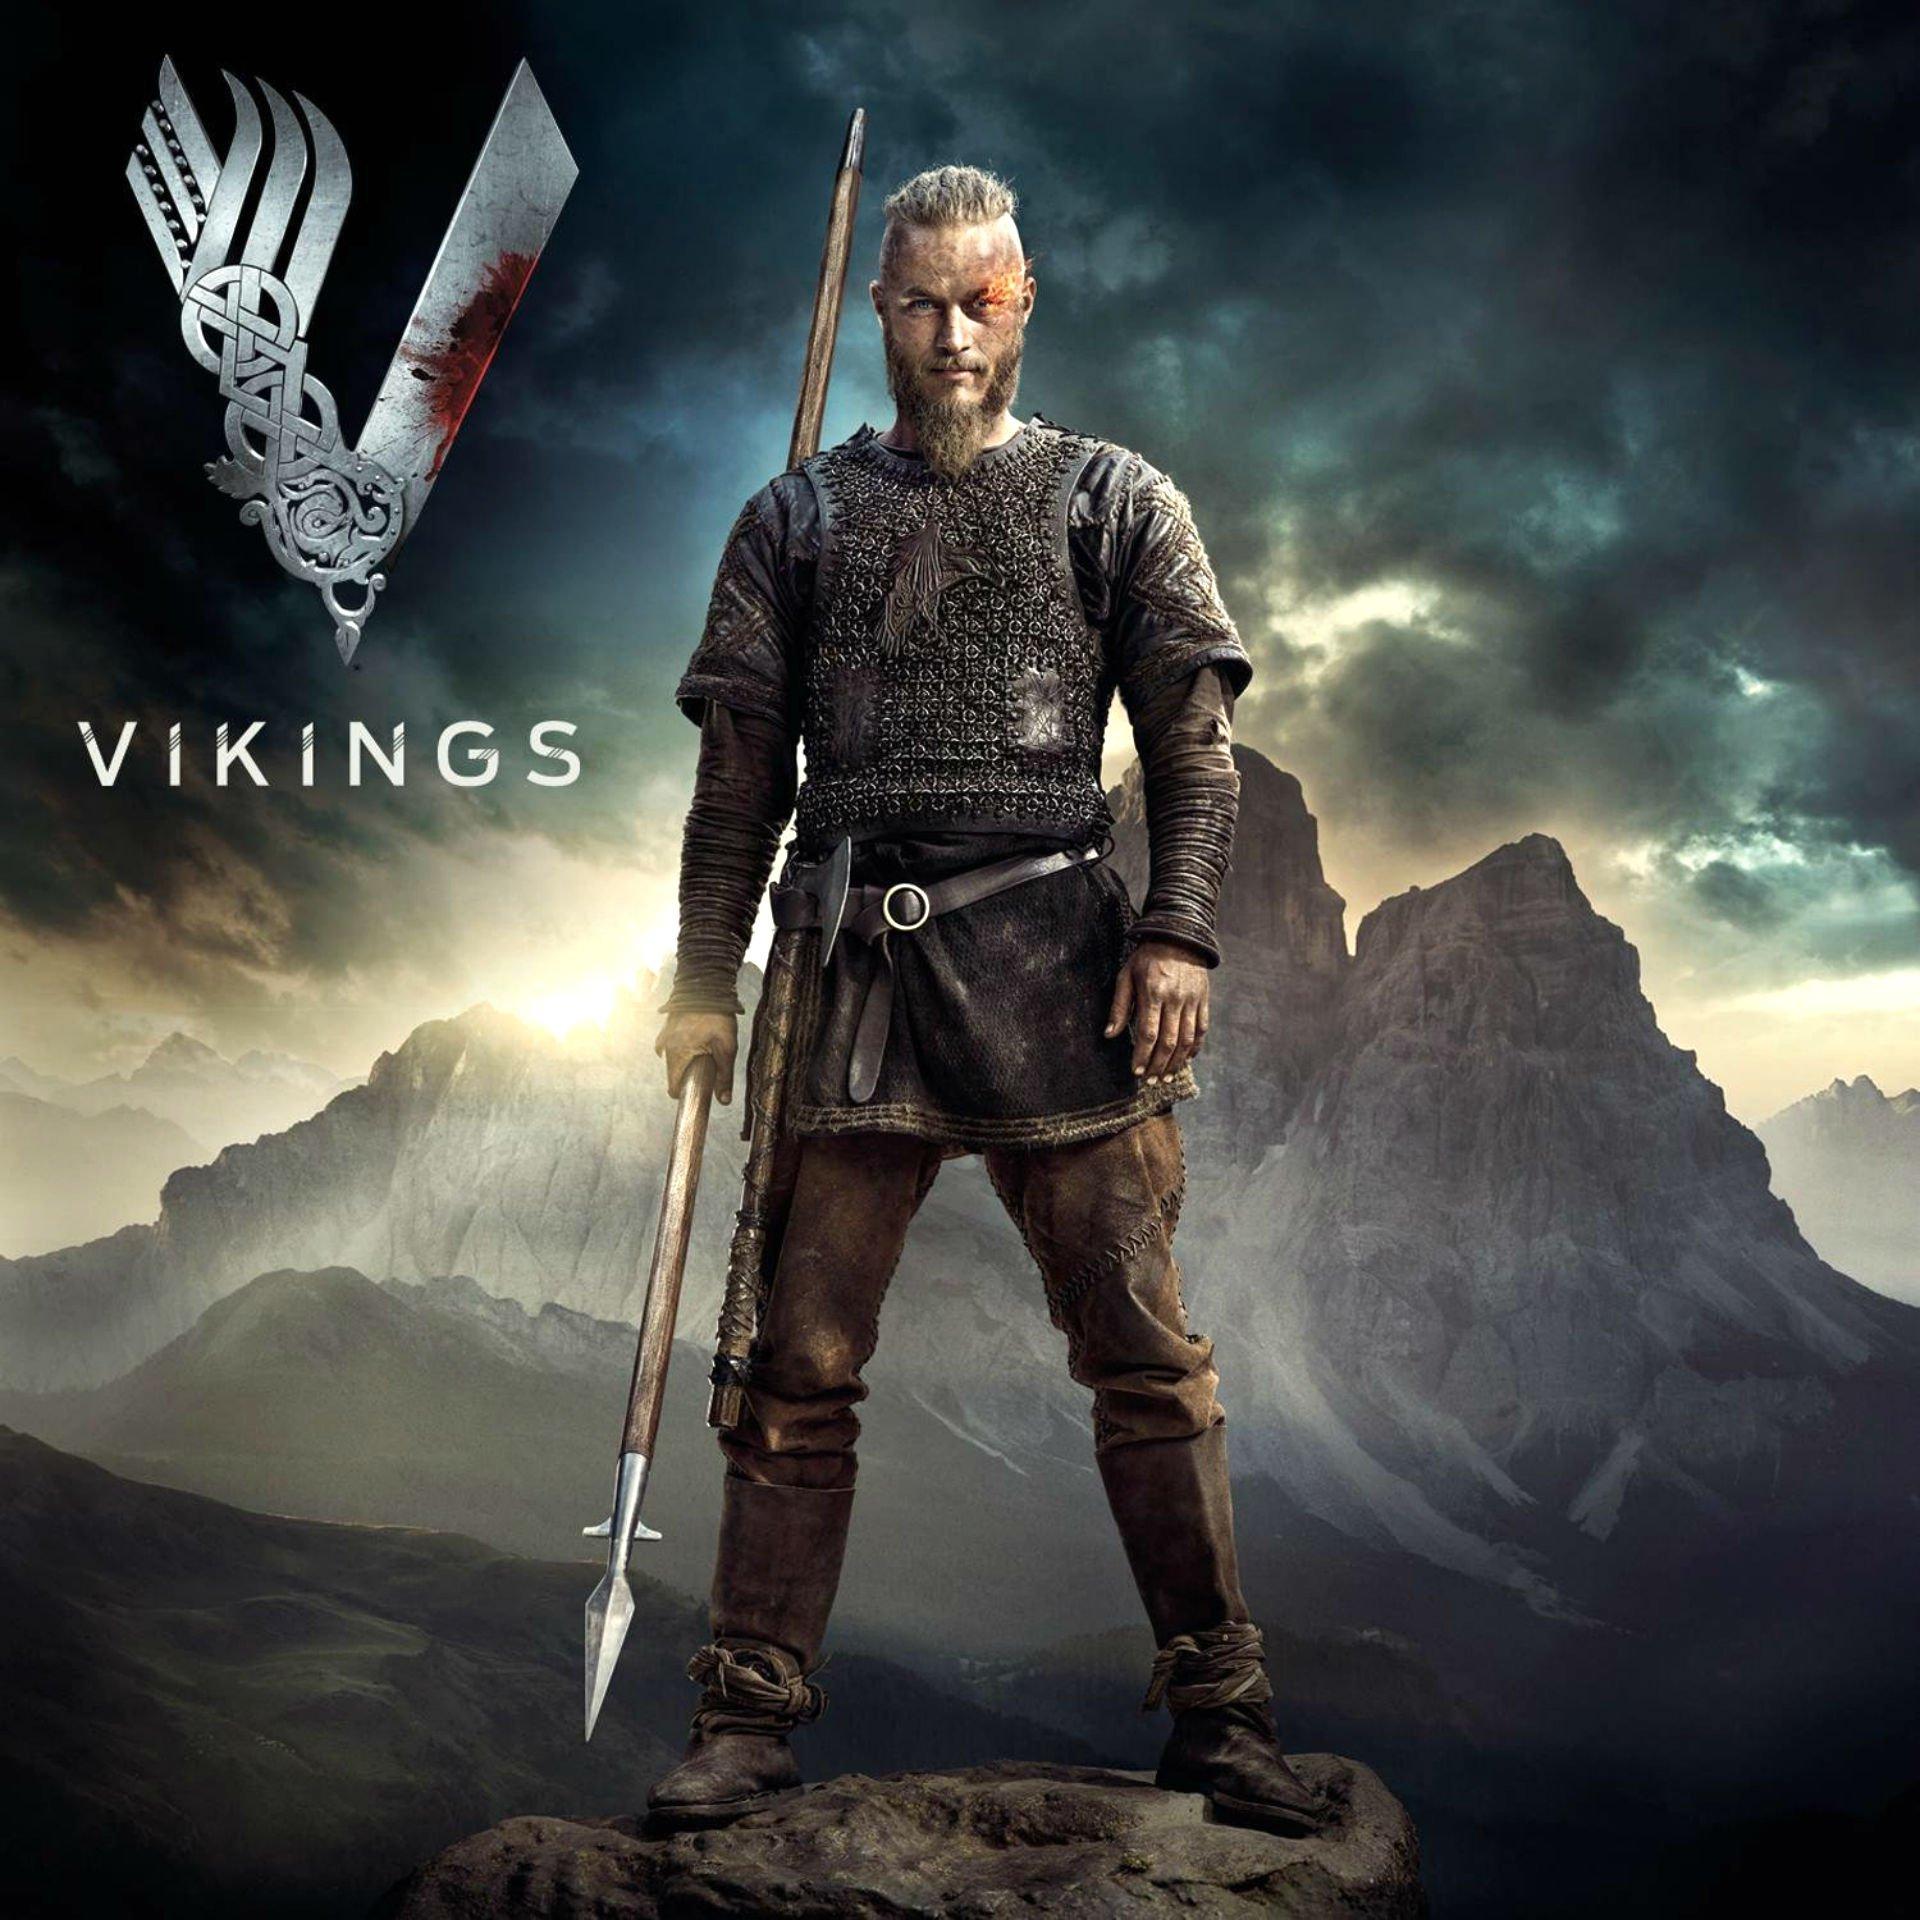 [43+] History Channel Vikings Wallpaper HD On WallpaperSafari